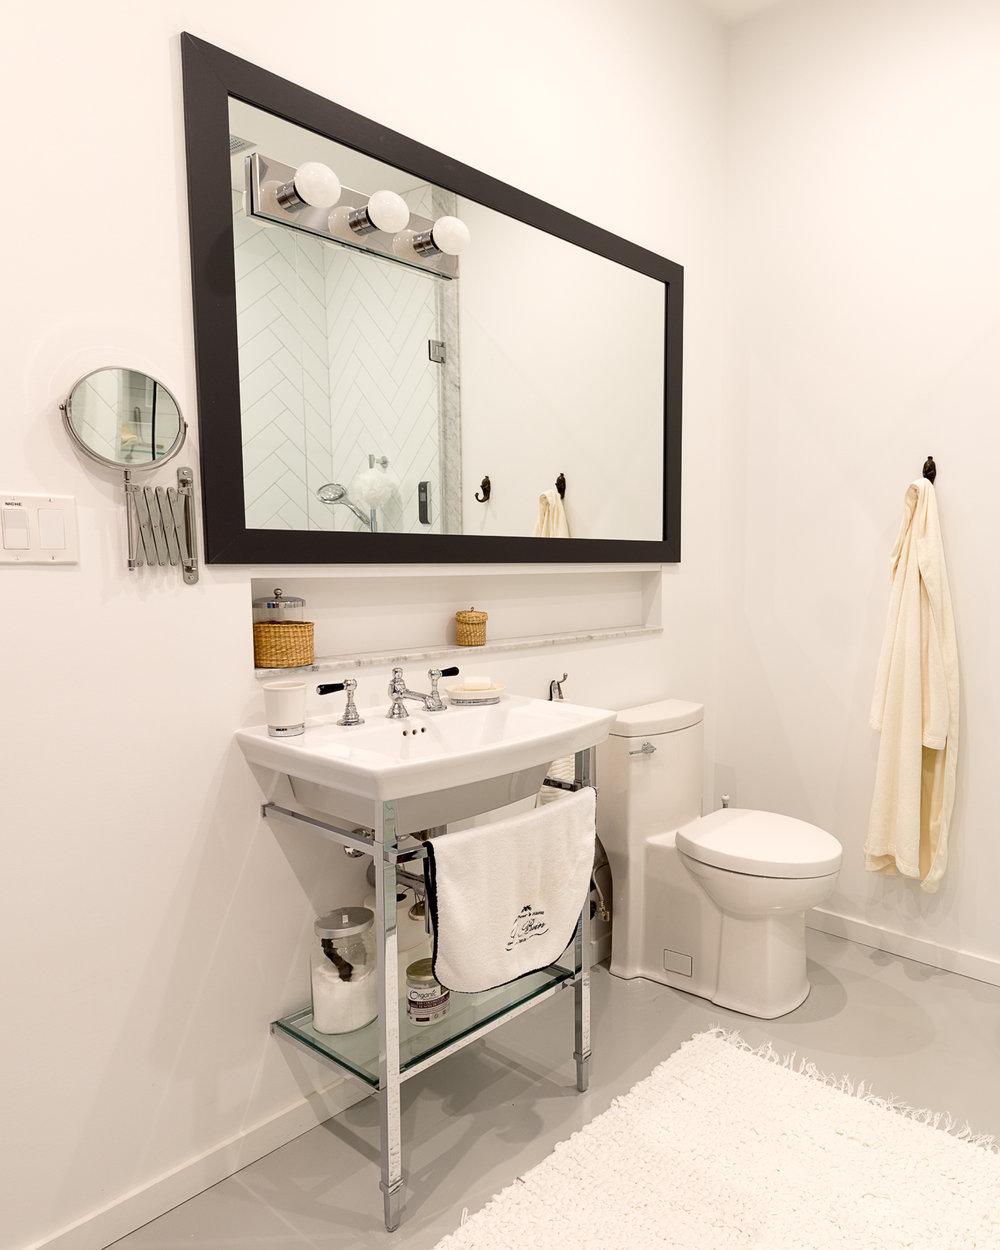 Bathroom Main Floor - with toilet and sink.jpg